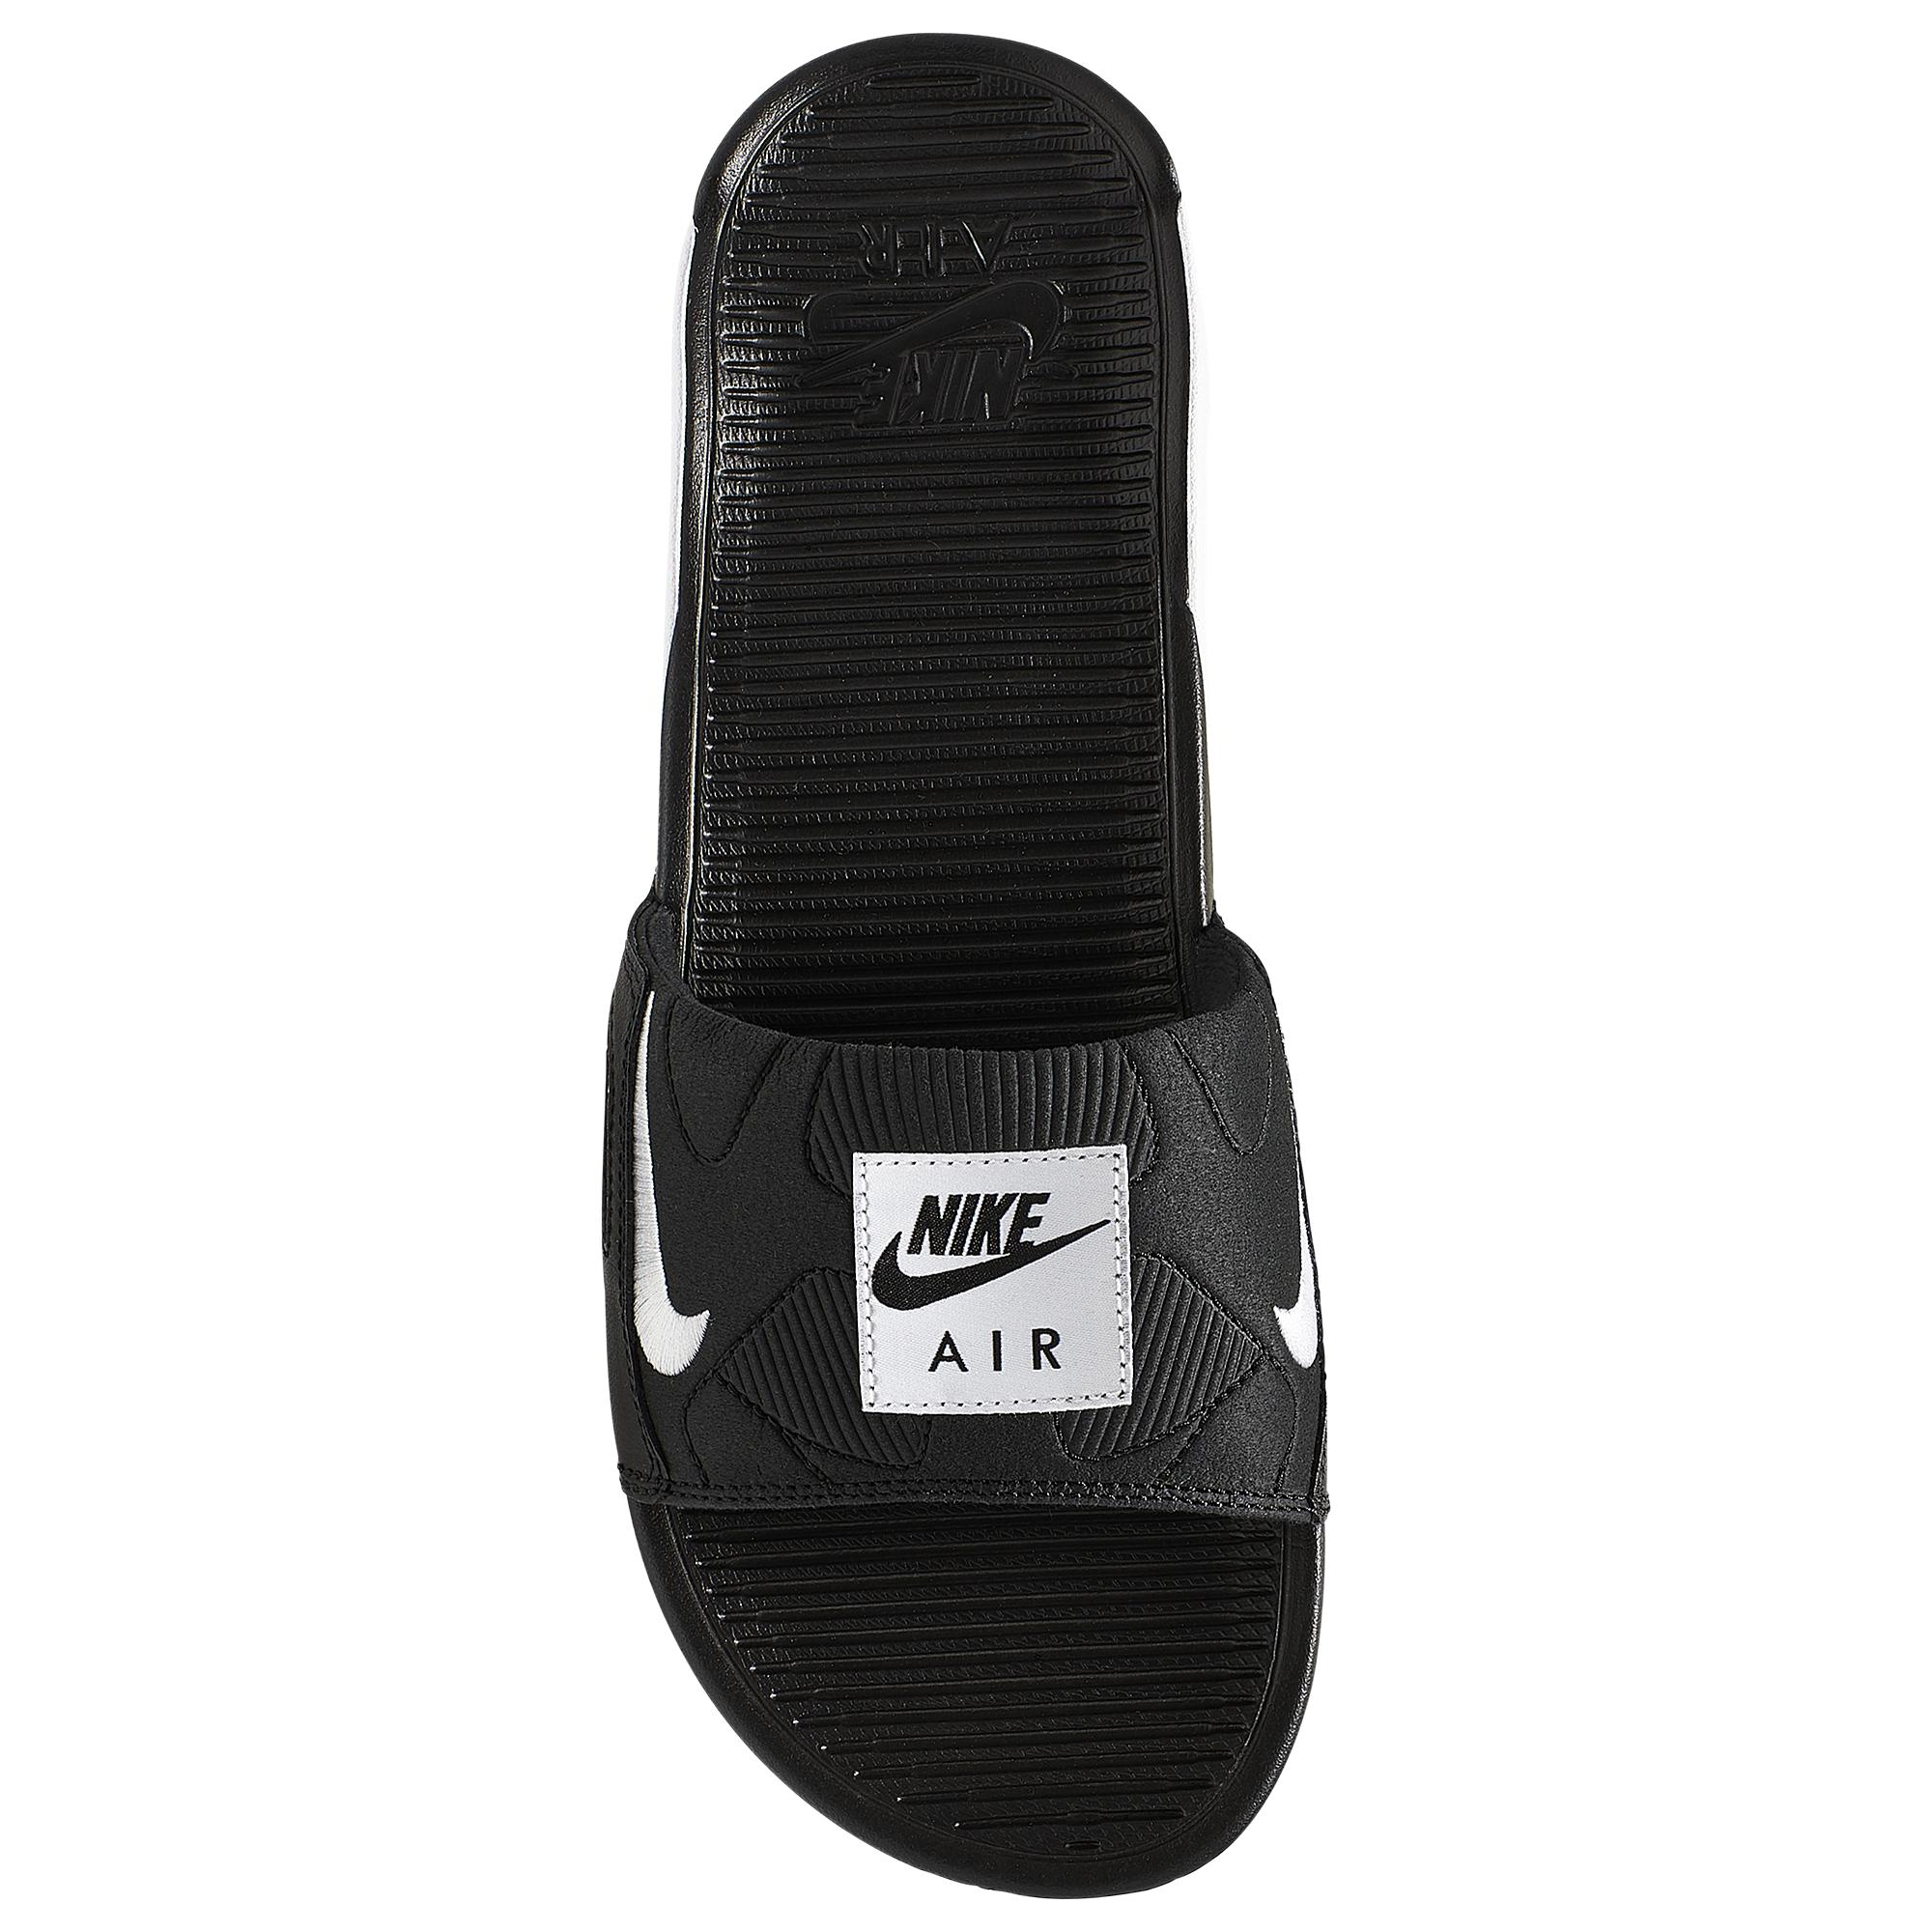 Nike Air Max 90 Slide in Black/White (Black) for Men - Save 52% - Lyst